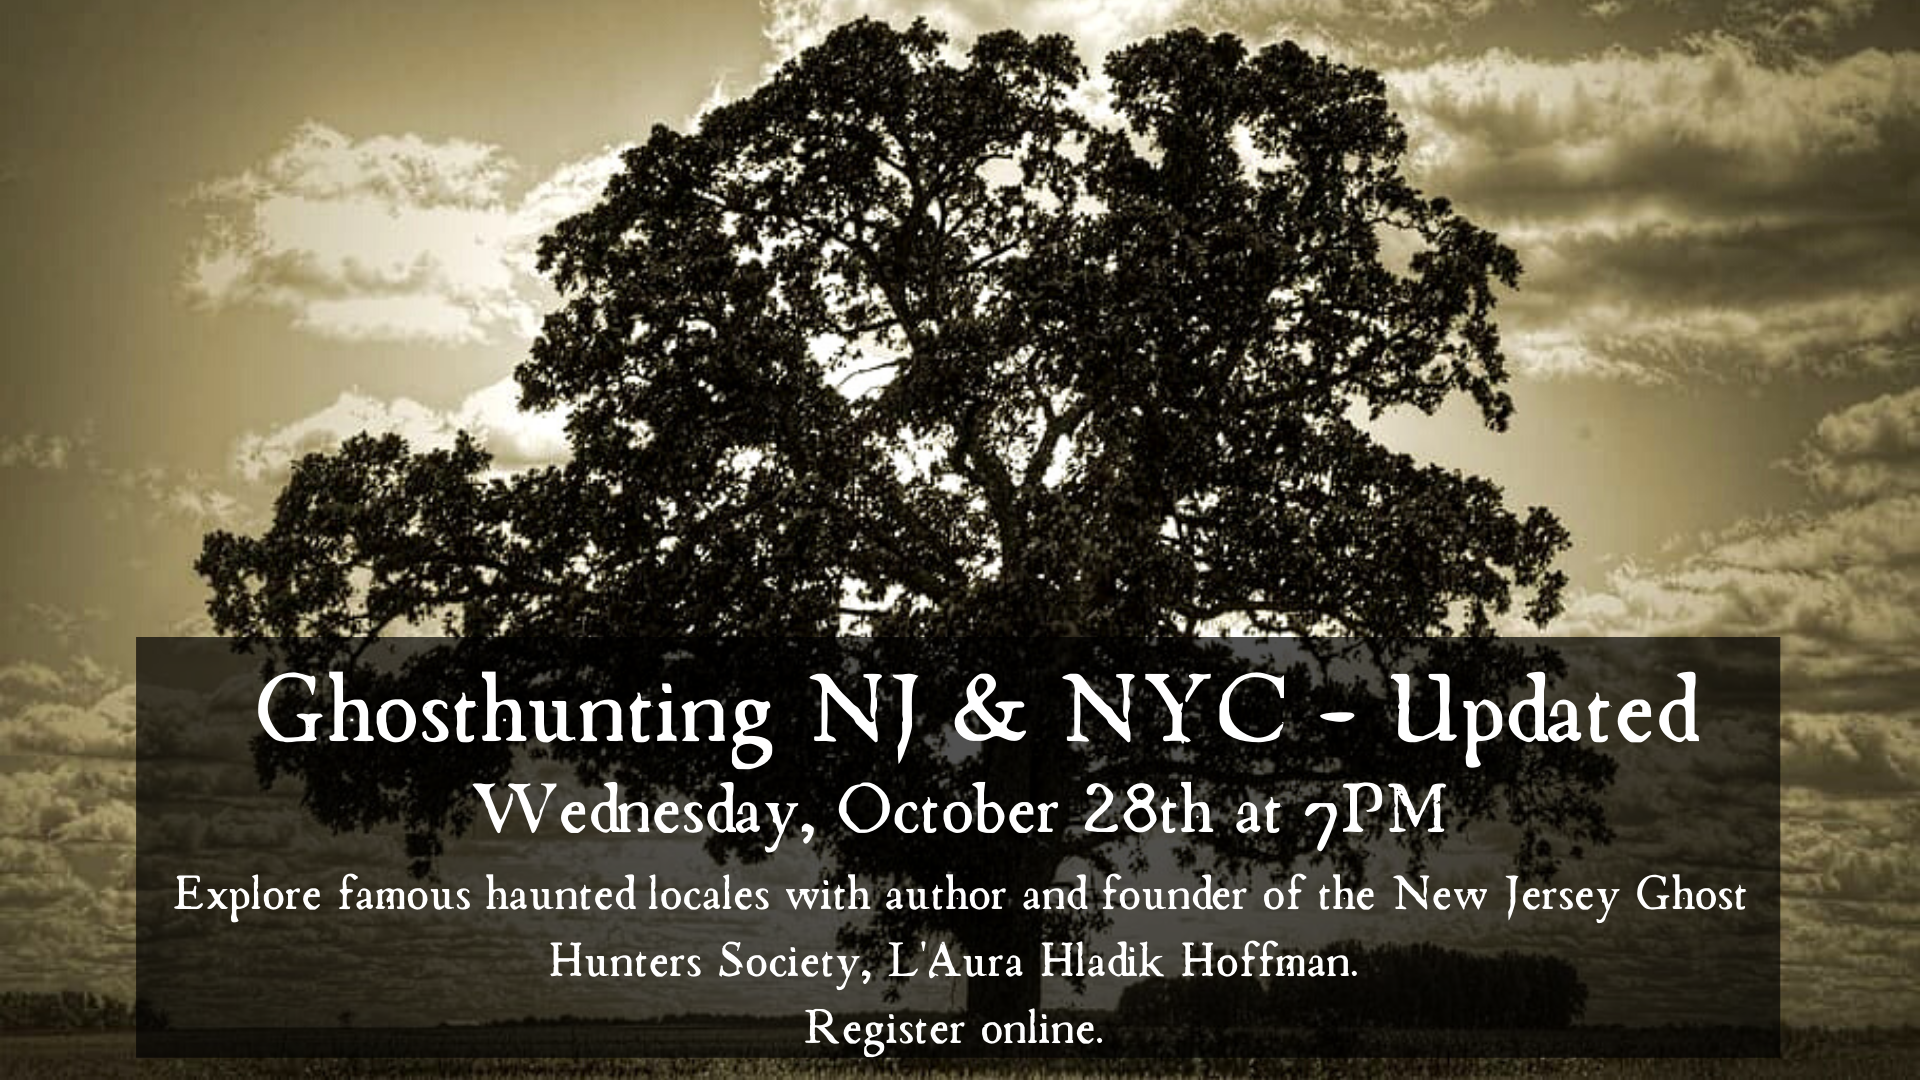 Virtual Ghosthunting NJ & NYC: Updated